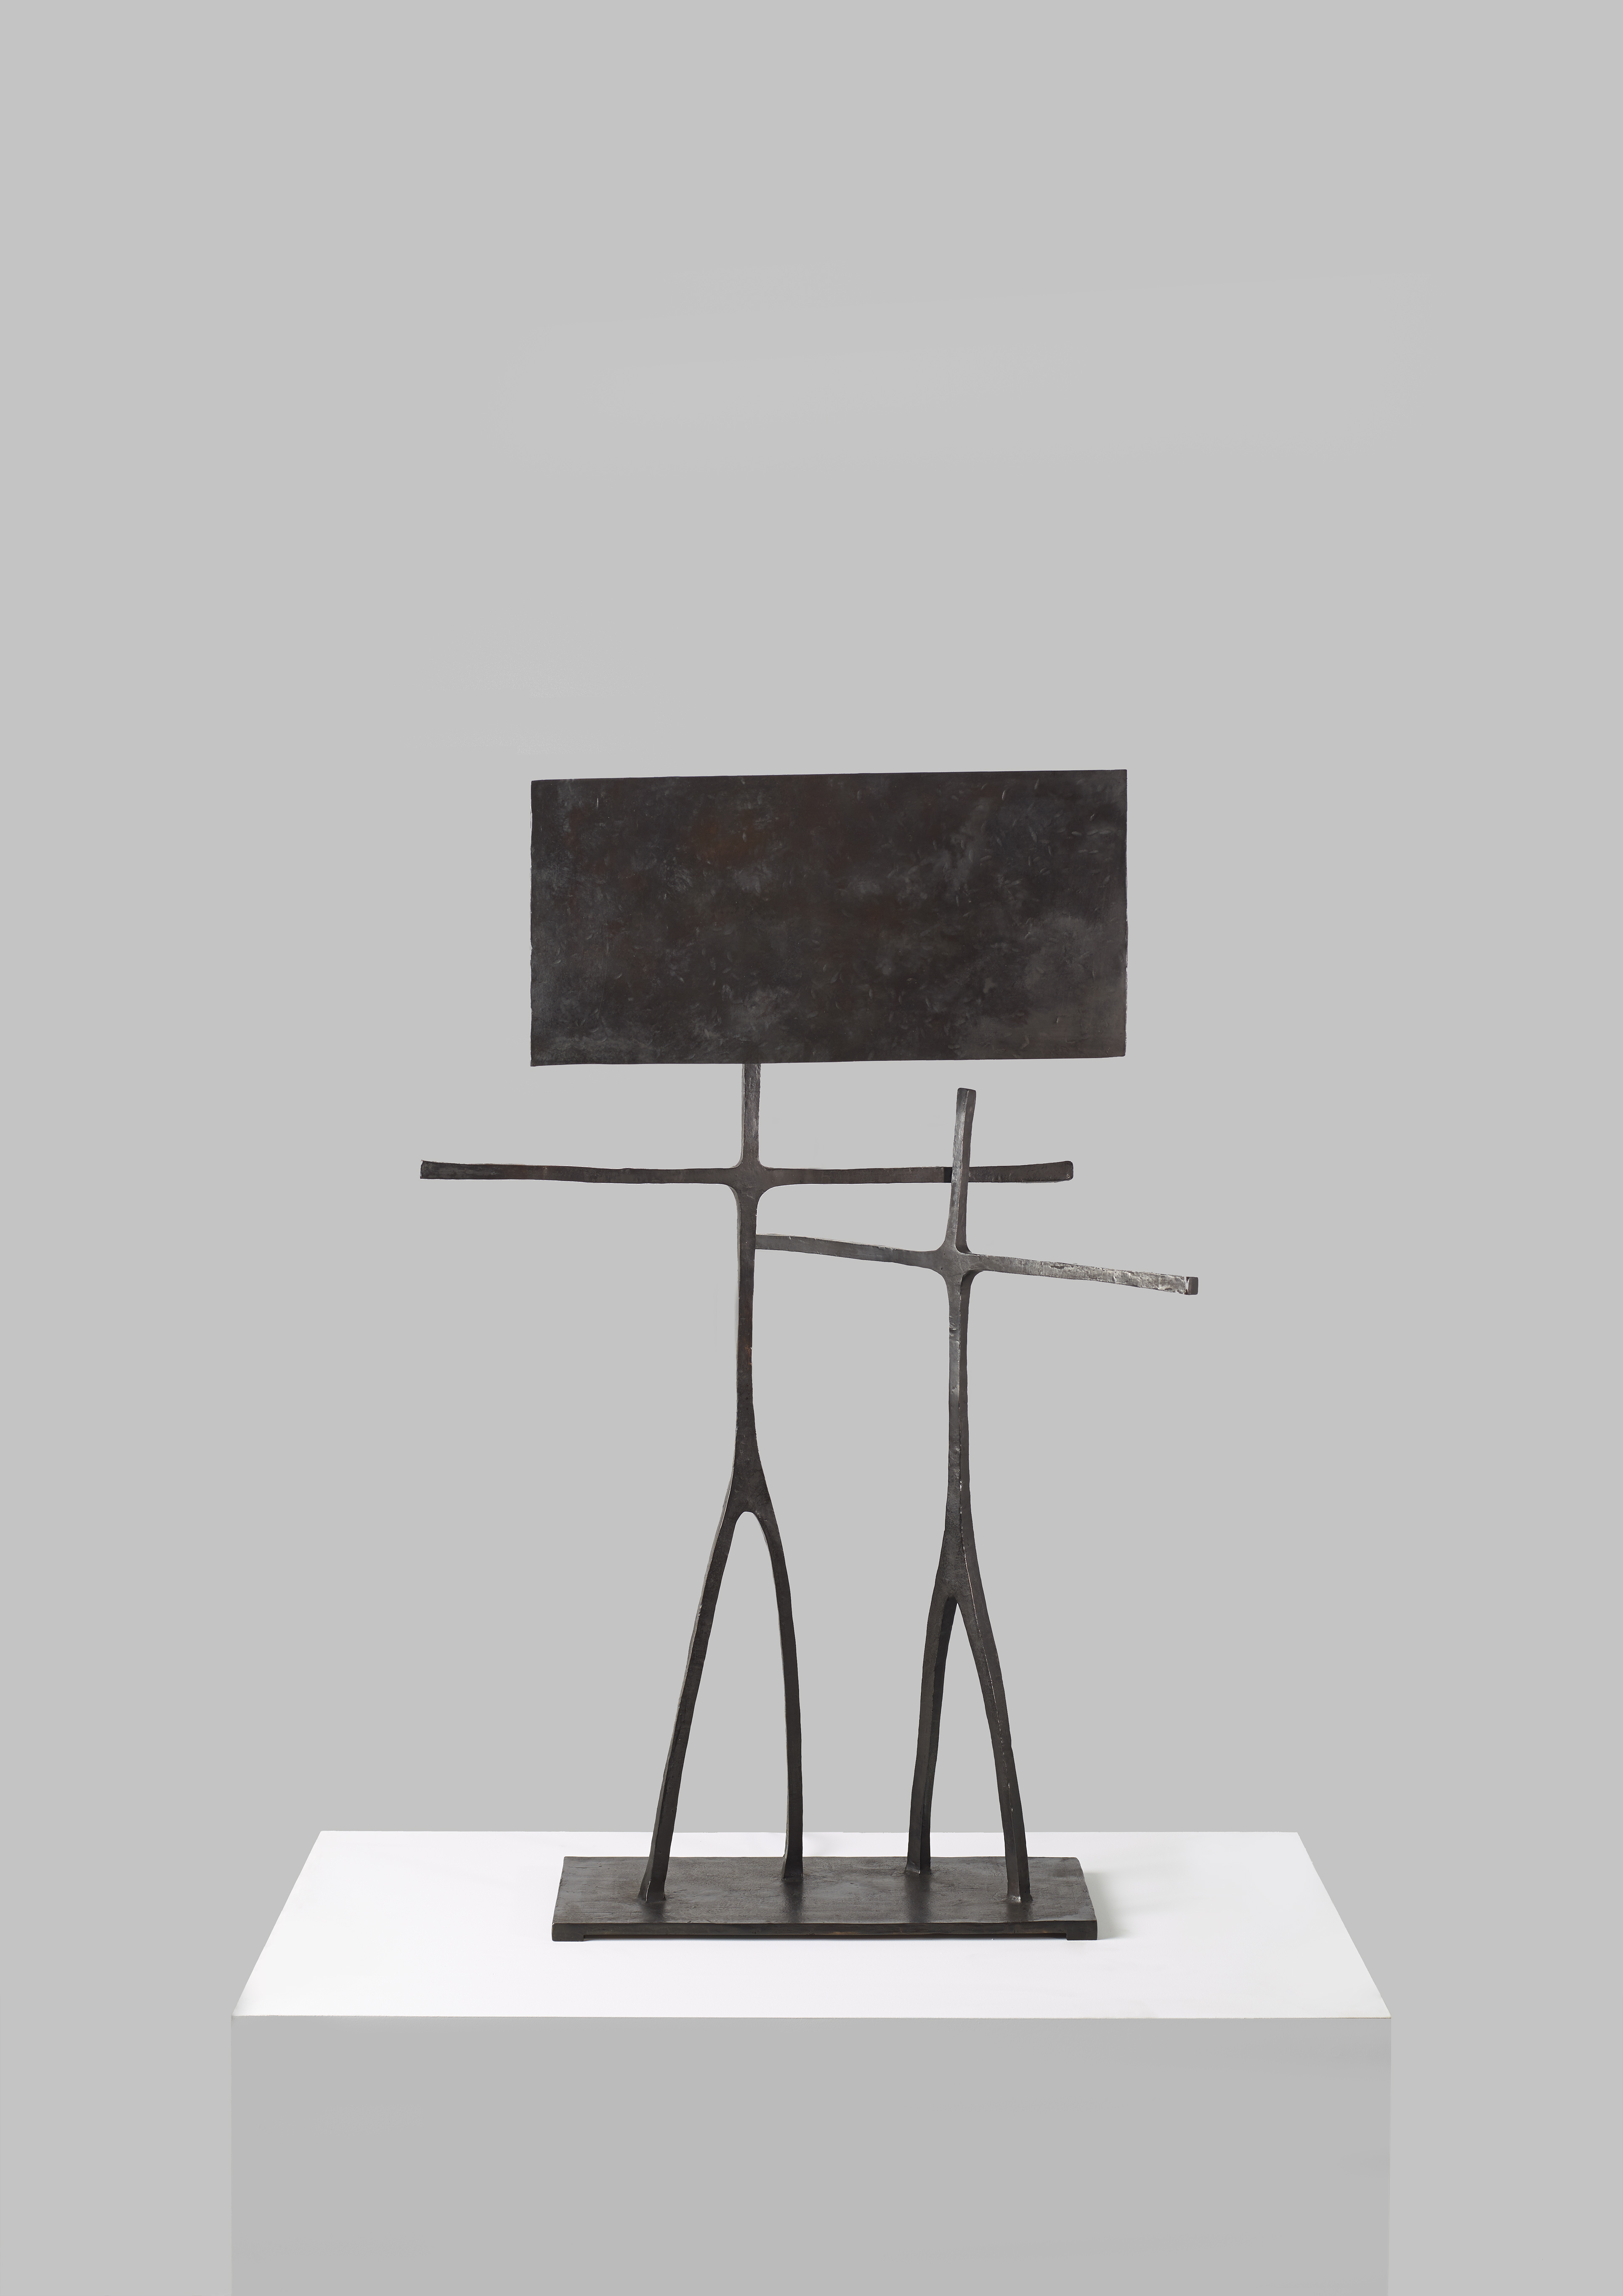 Atelier van Lieshout - Together Lamp © Carpenters Workshop Gallery